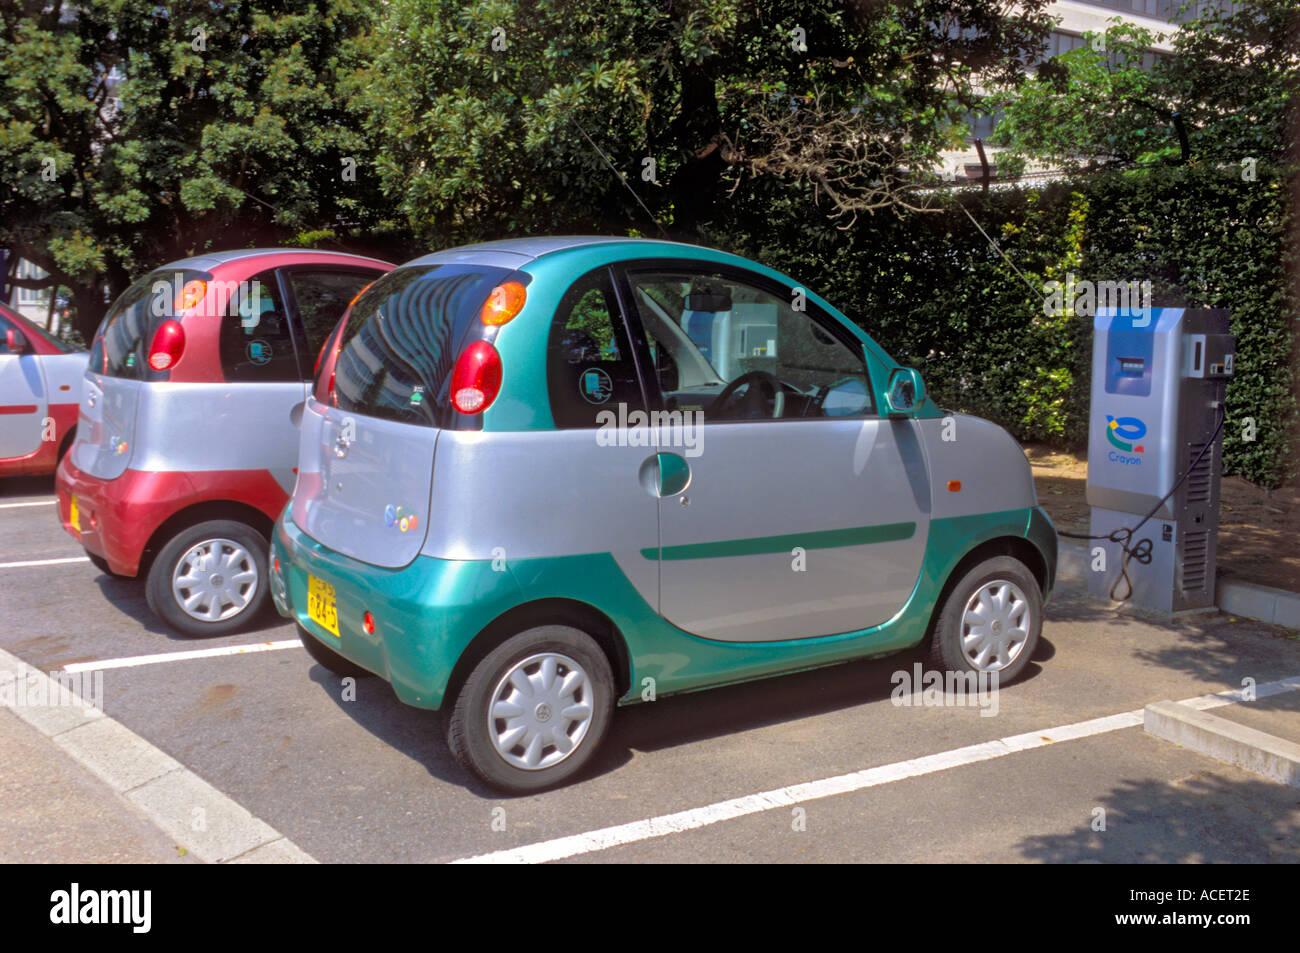 Toyota Ecom Experimental Prototype Electric Mini Car Charging Its